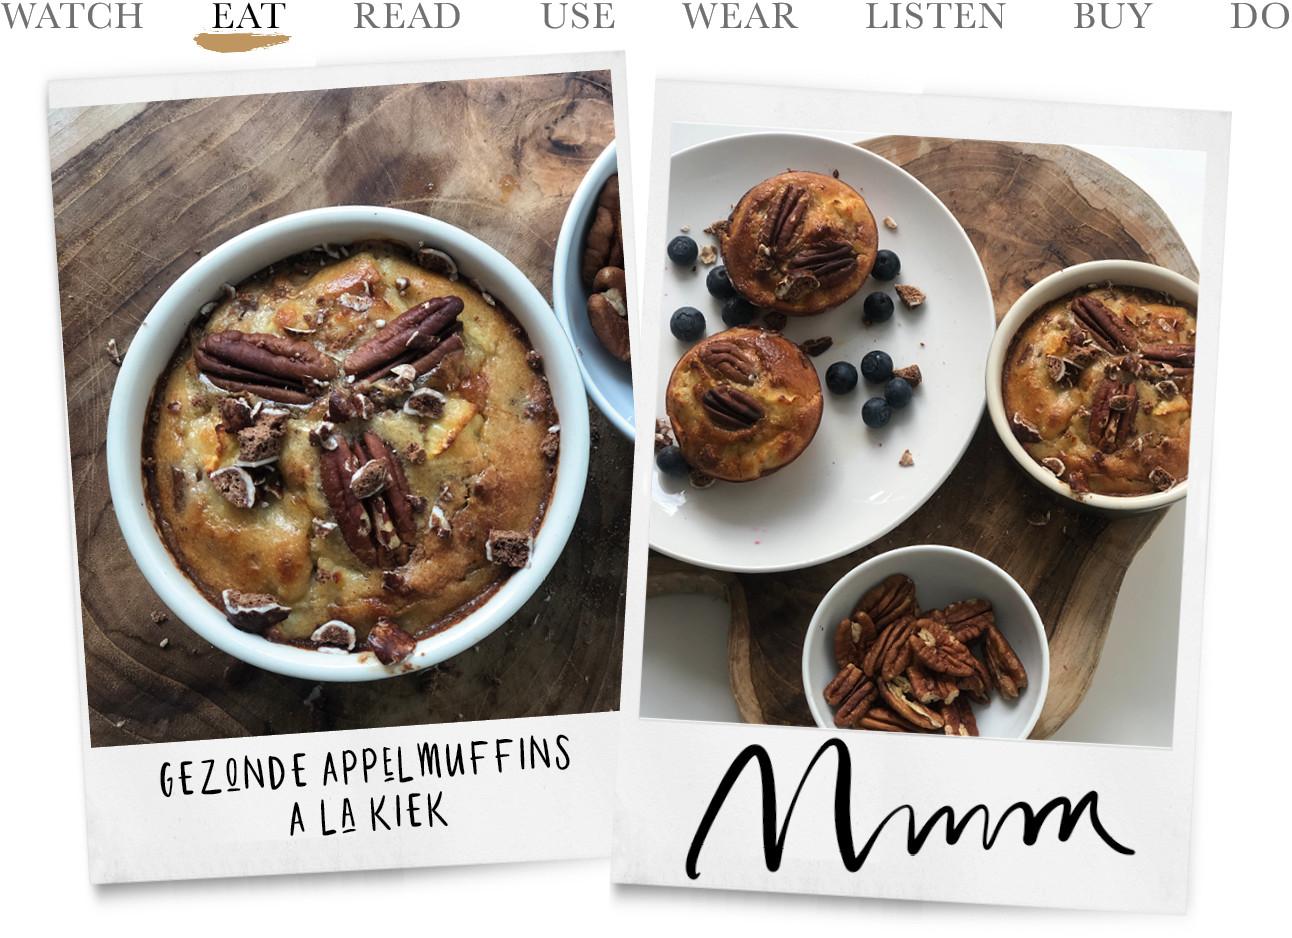 Eat: de inmiddels legendary ontbijtmuffins